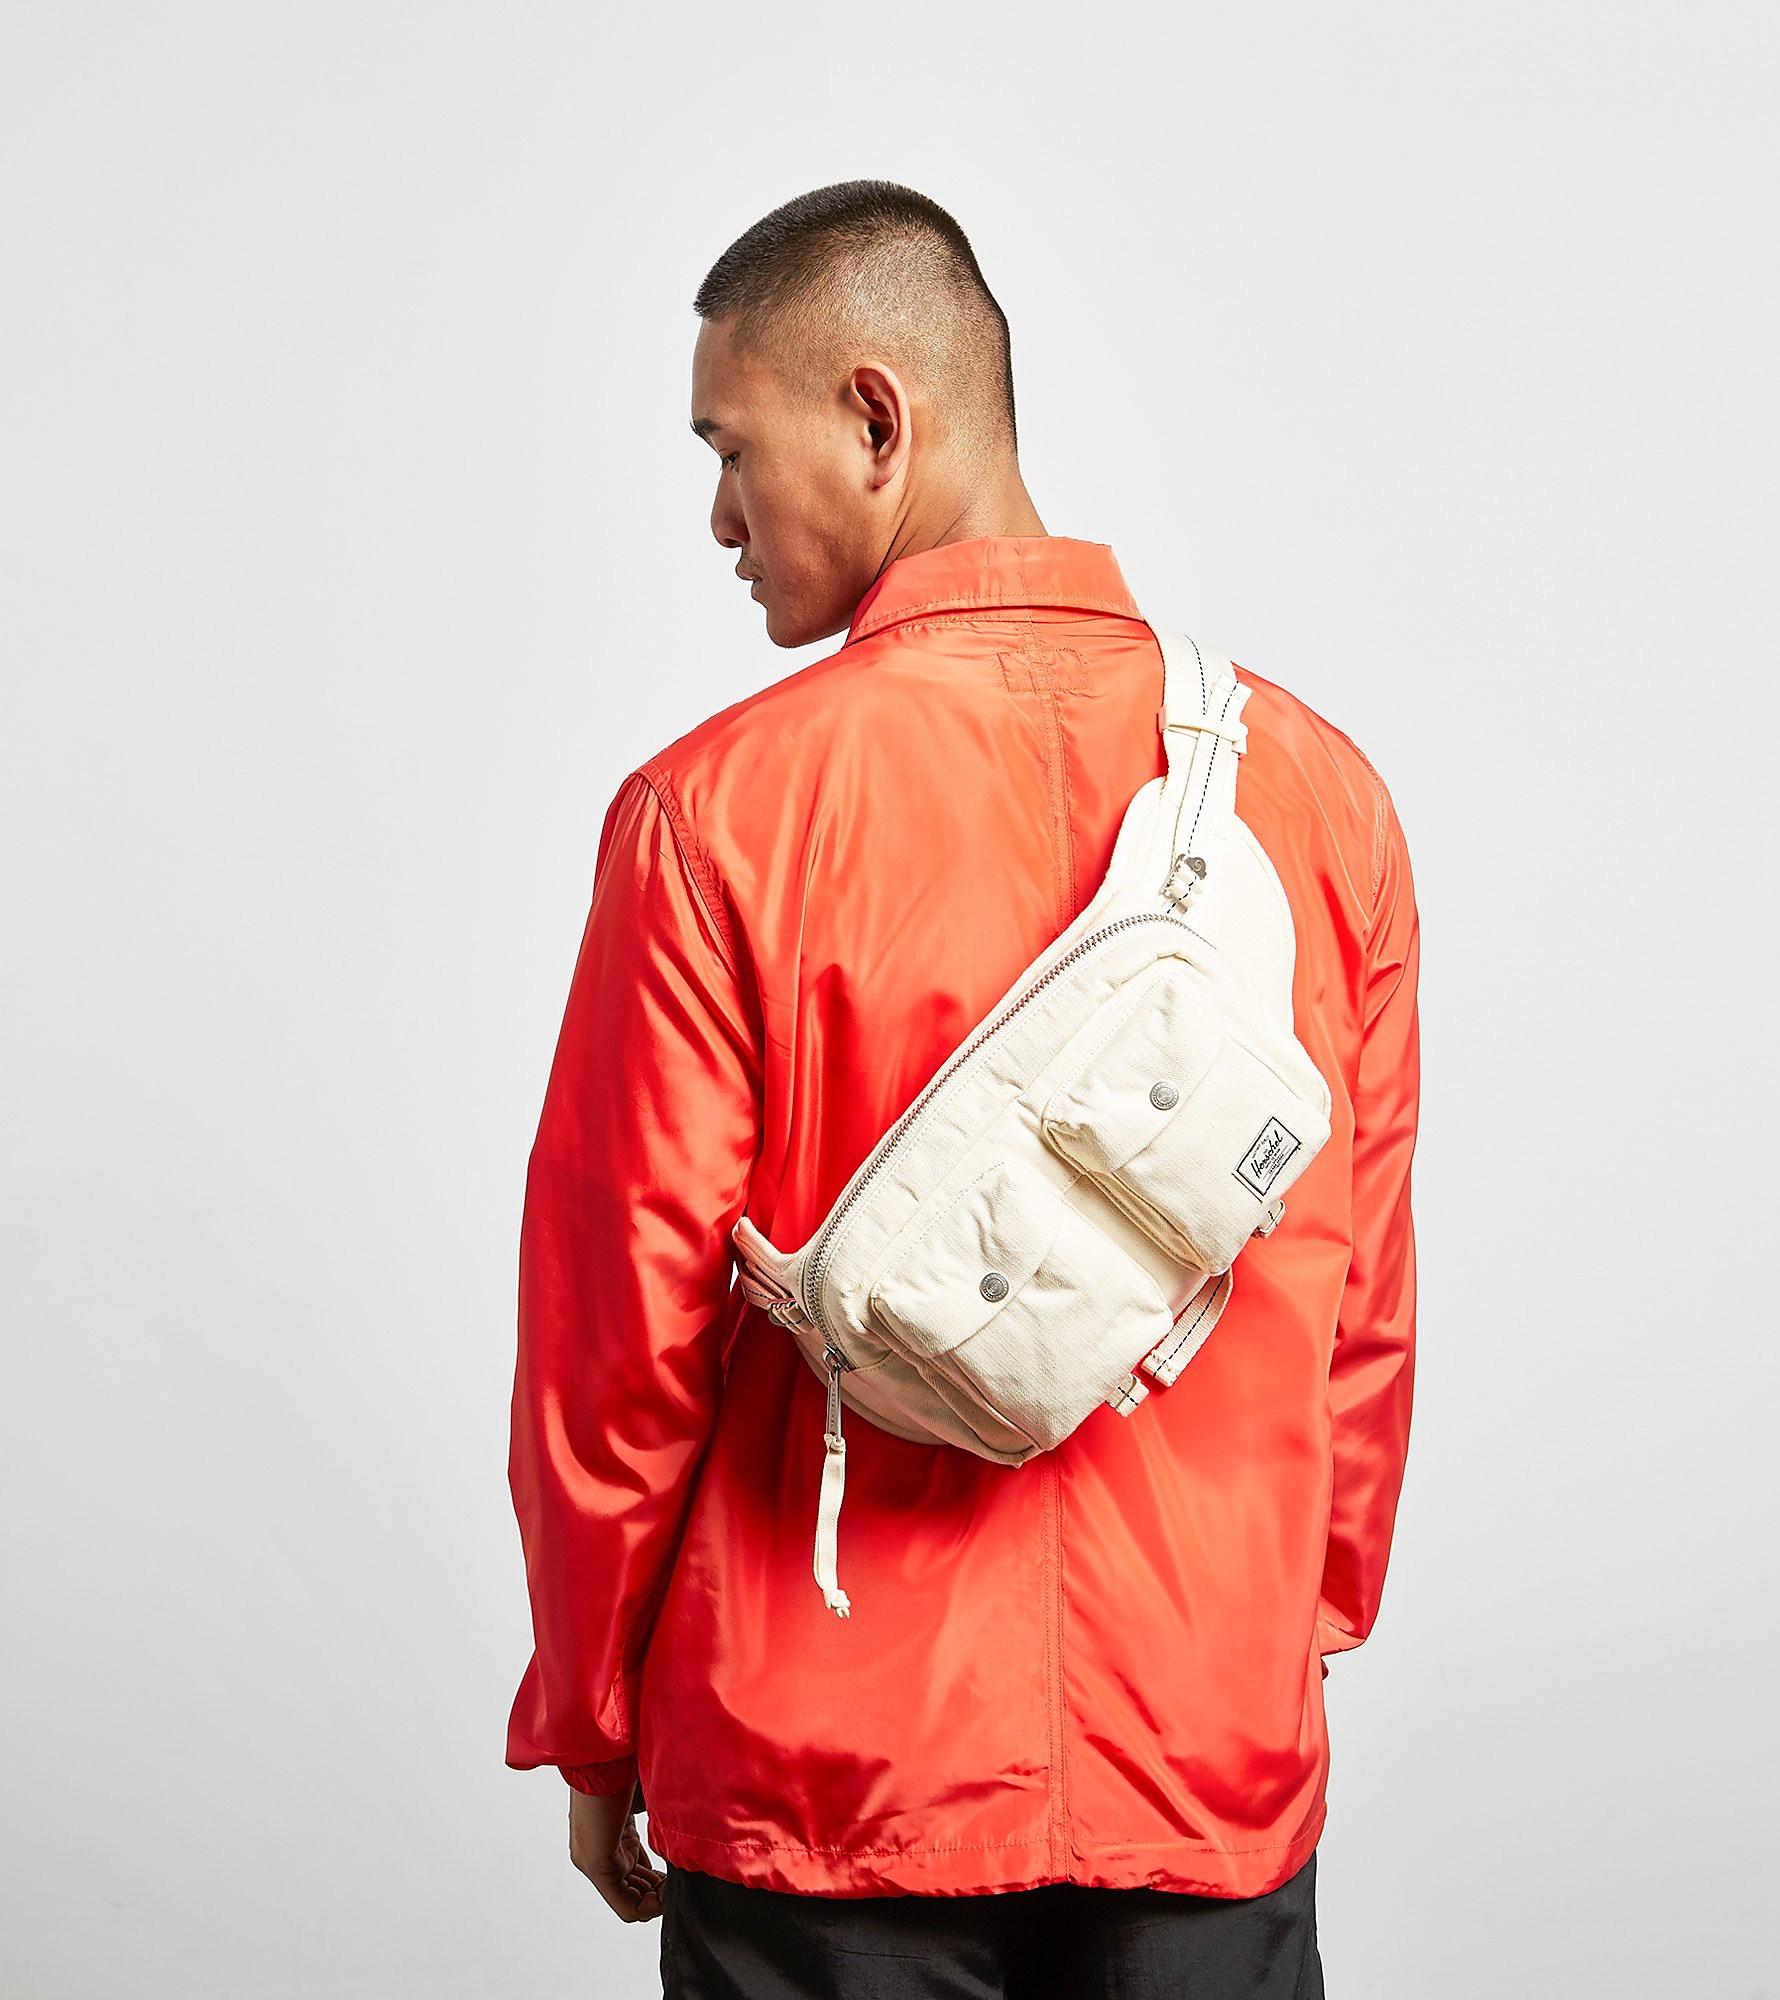 Herschel Supply Co Eighteen Surplus Waist Pack Bag